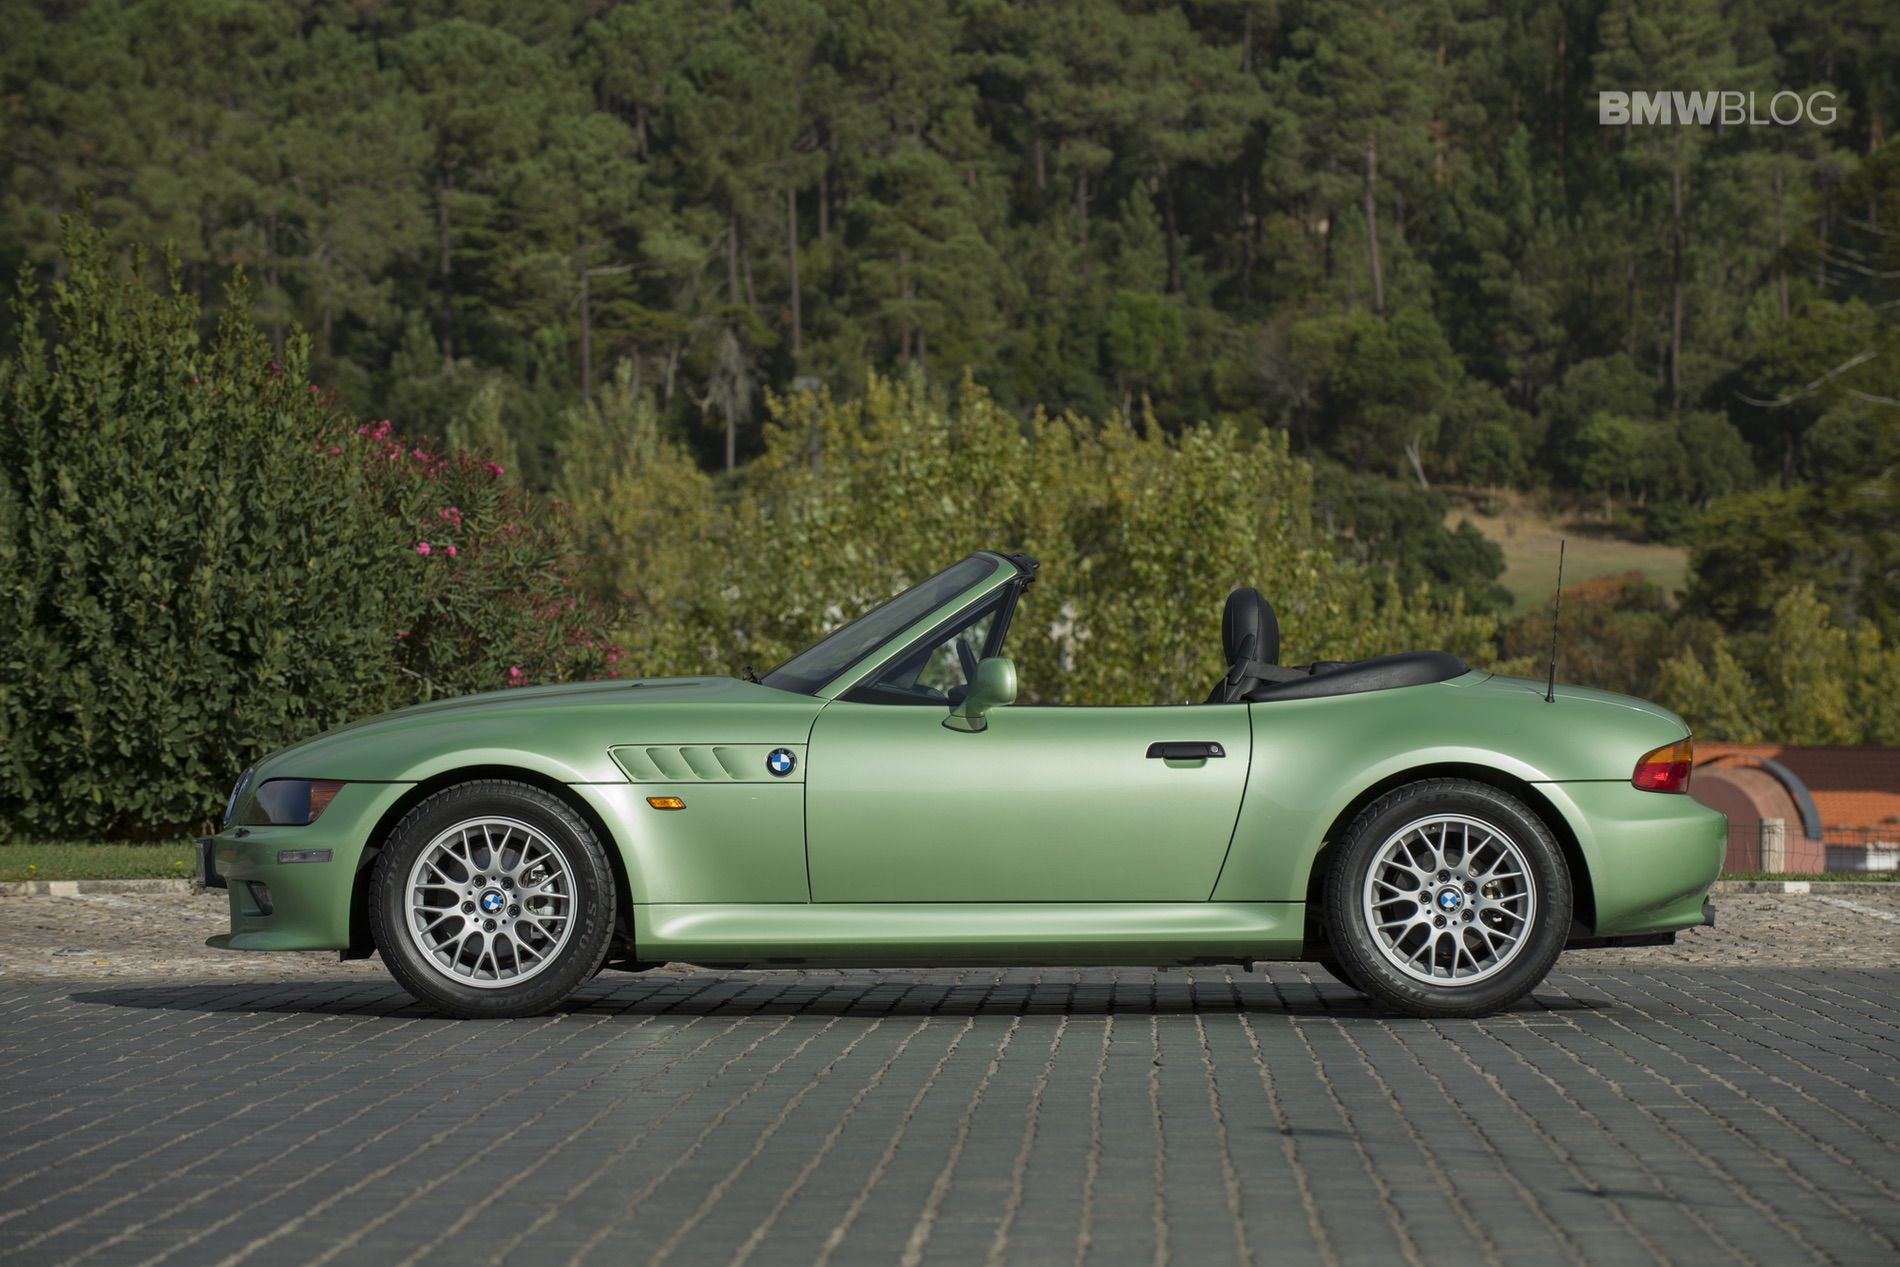 Stunning Bmw Z3 Roadster In Palmetto Green